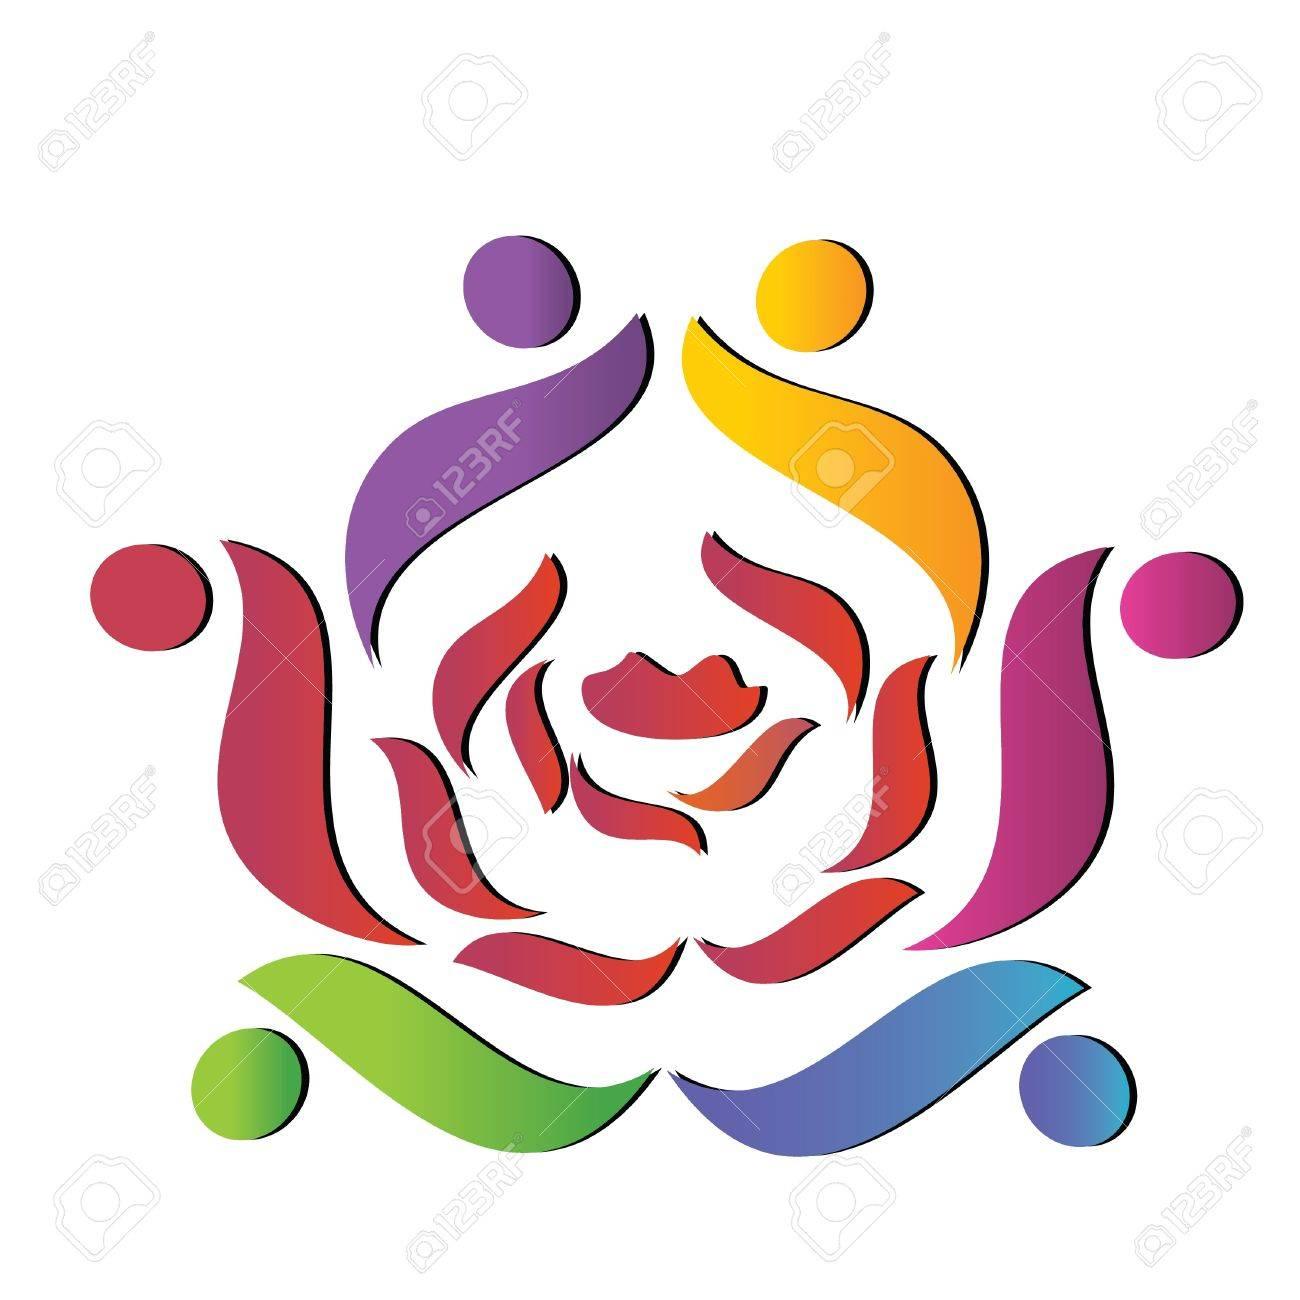 Team helping rose logo Stock Vector - 10821235